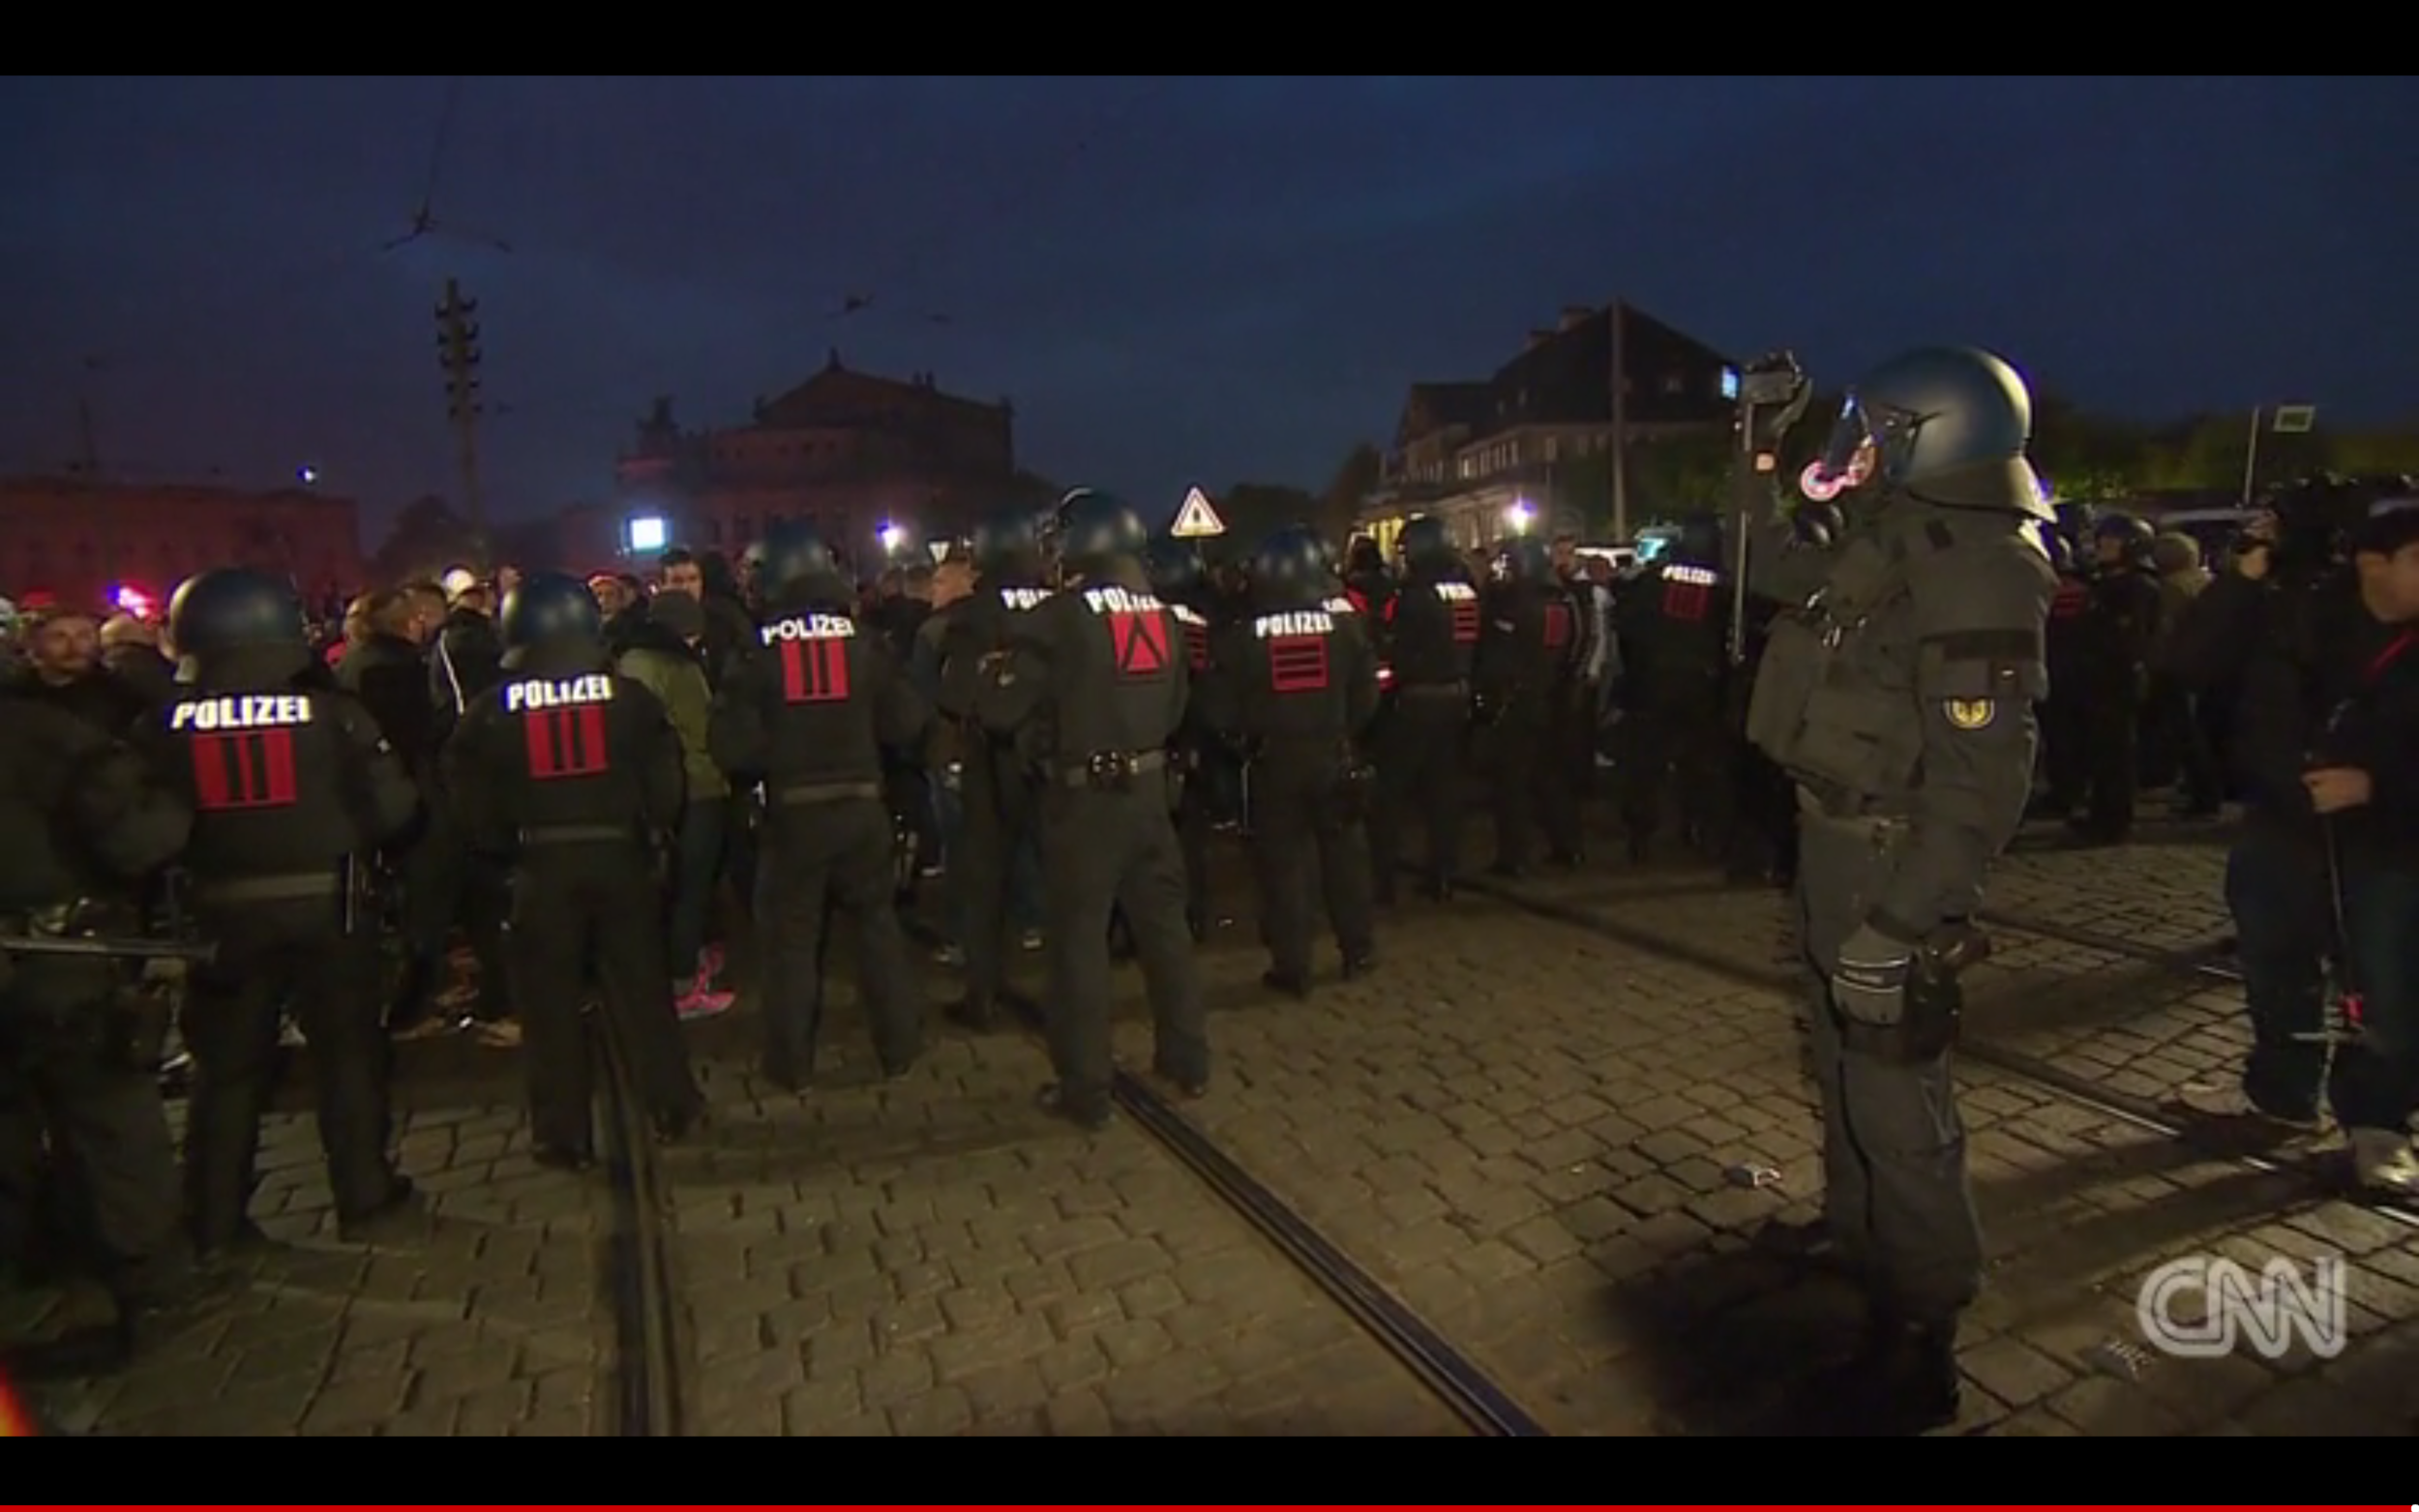 Germany Anti-Migrant Protest